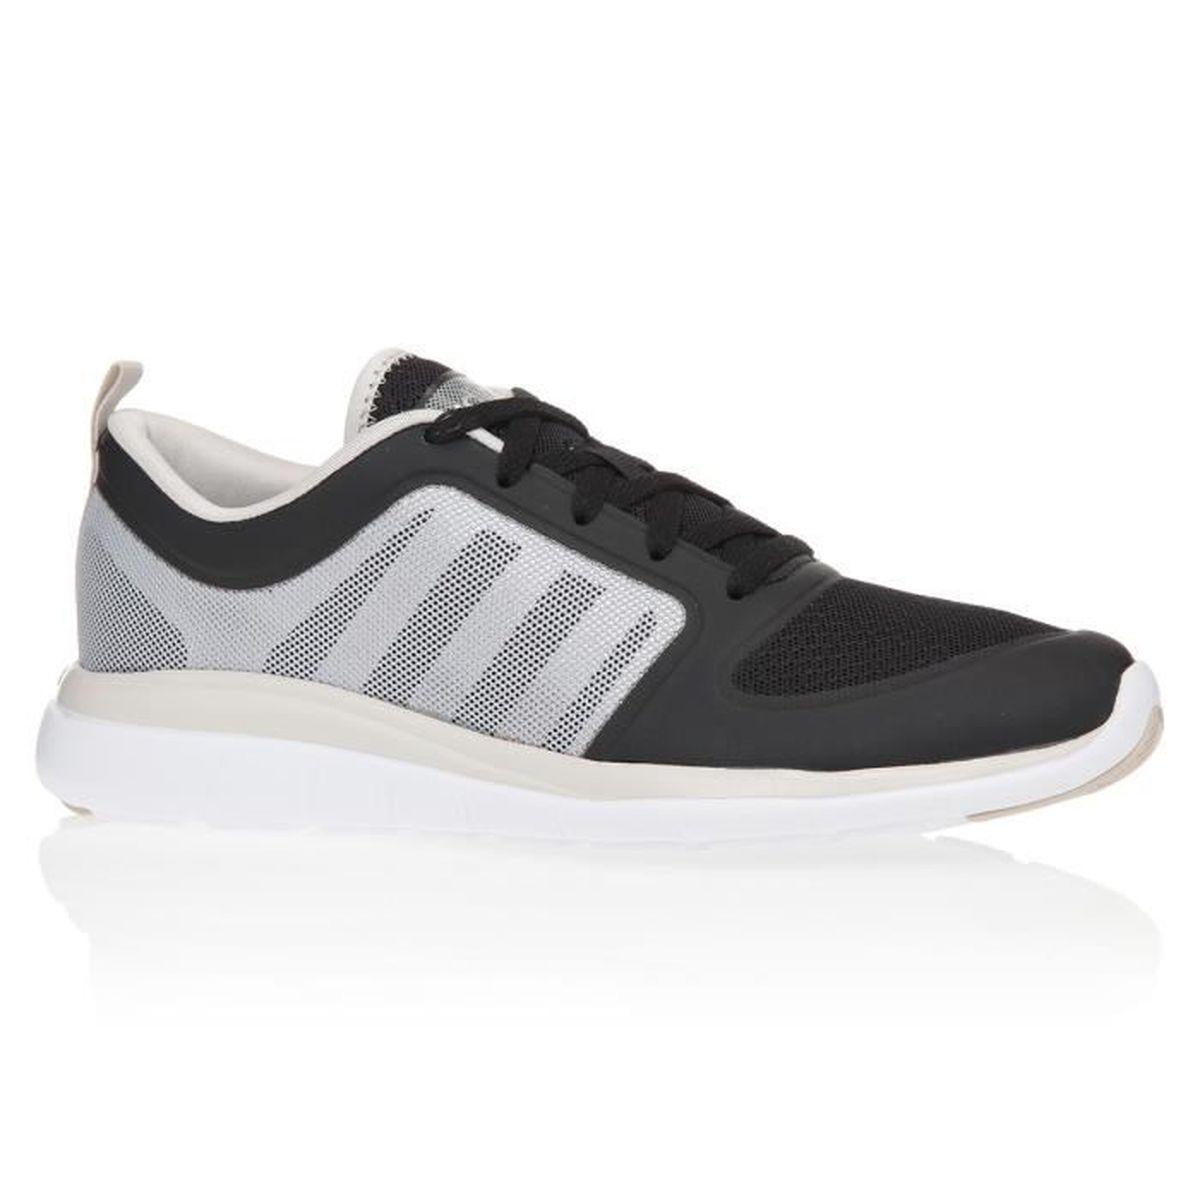 Adidas Neo Femme Grise